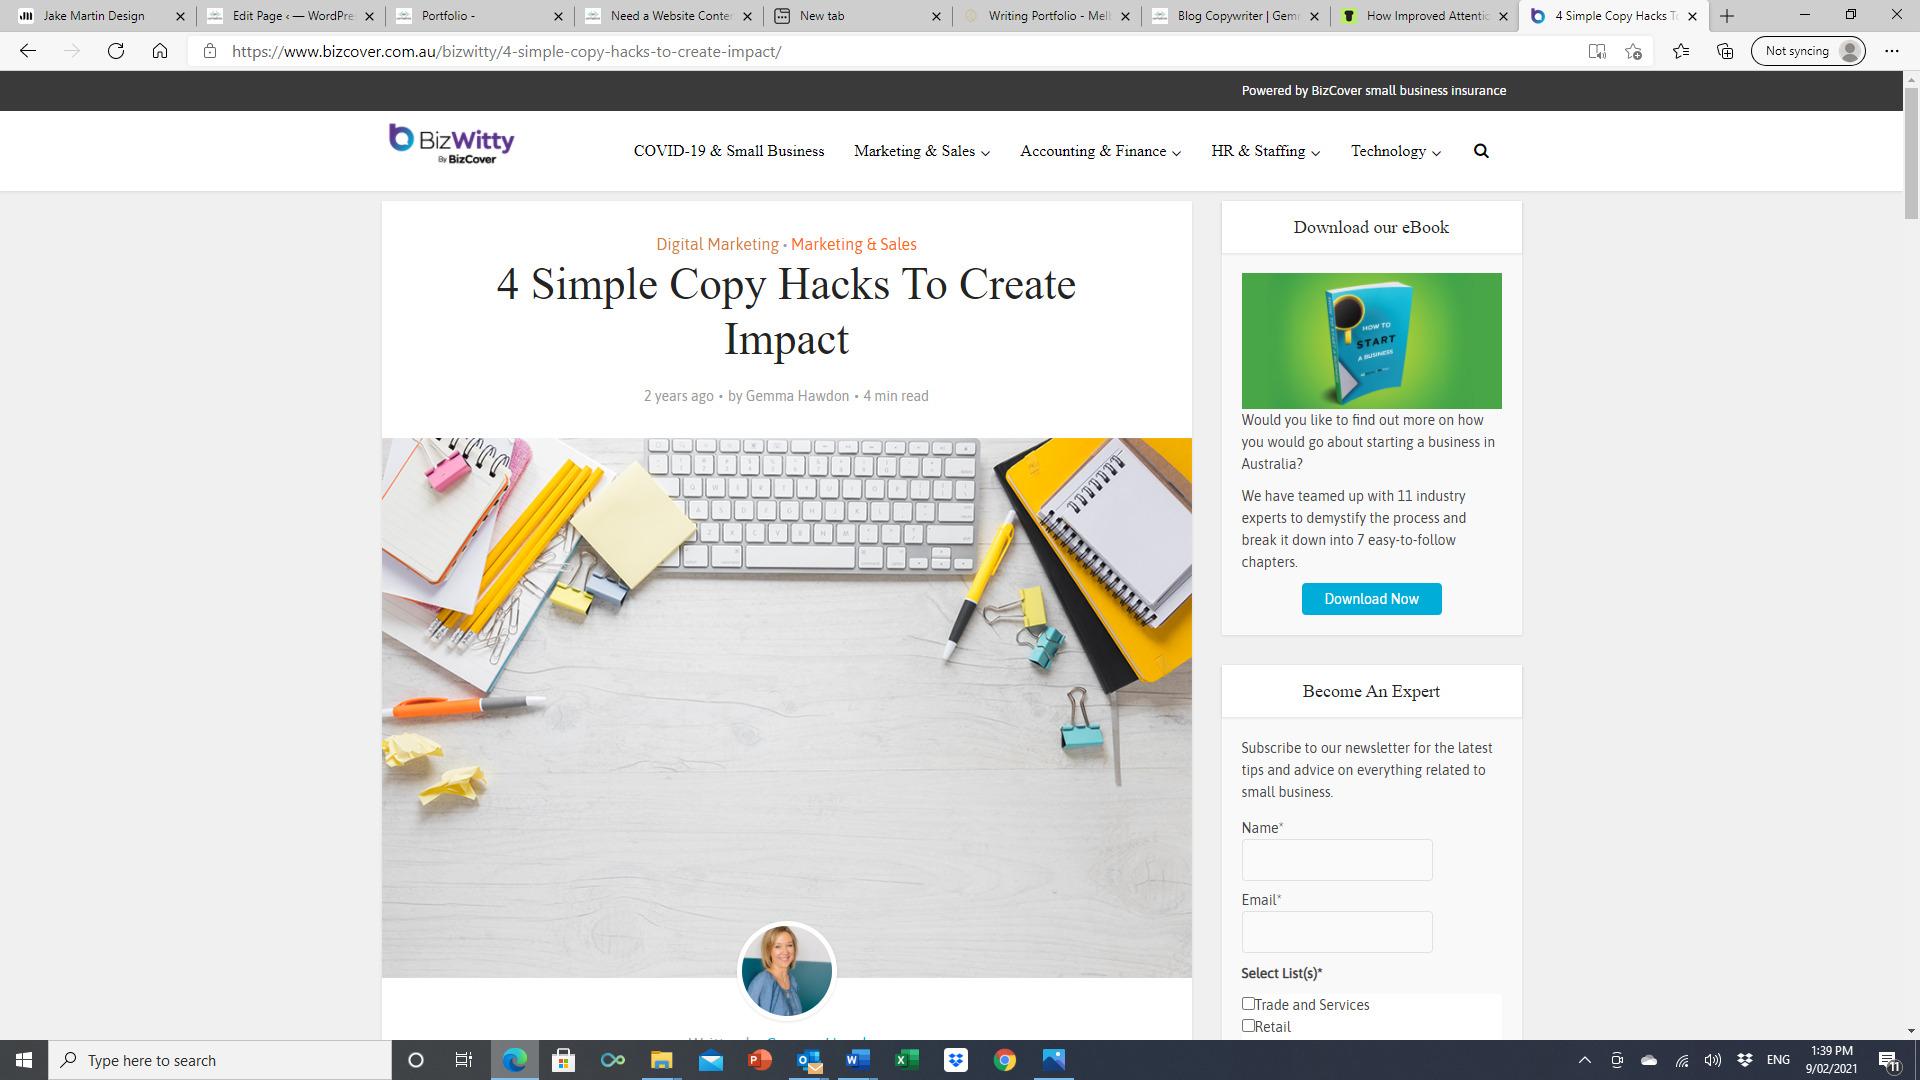 Biz Witty - 4 simple copy hacks to create interest